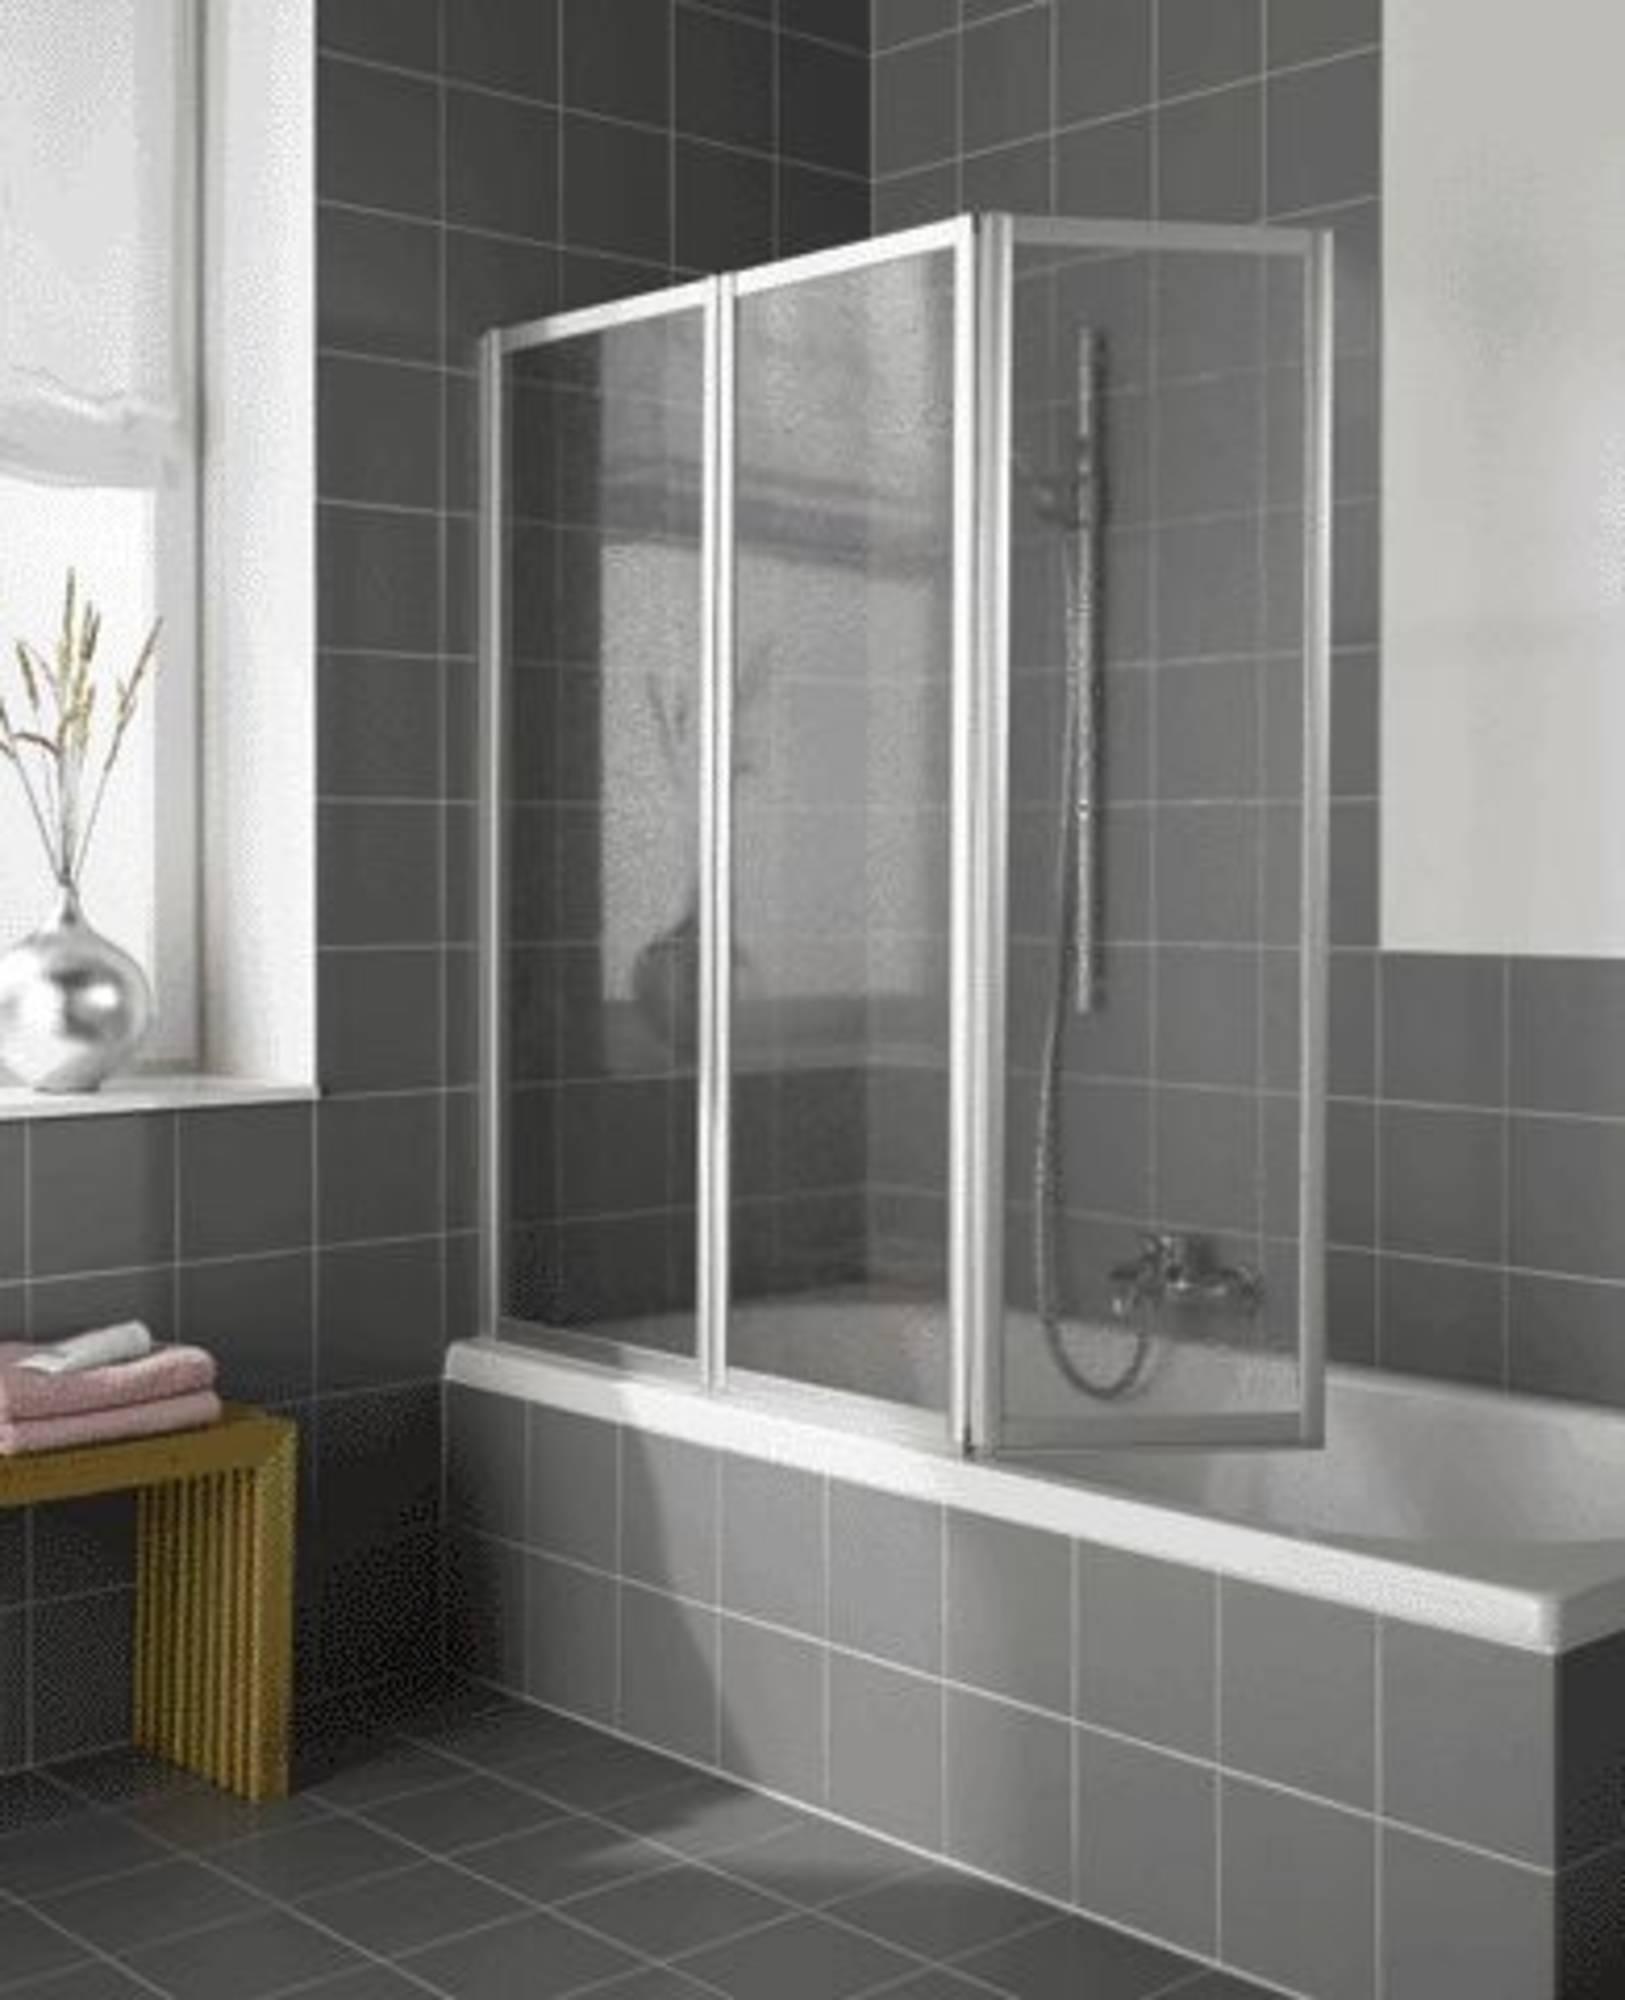 Kermi Vario badklapwand 3-delig 140 cm kunst parel Wit Ral 9016